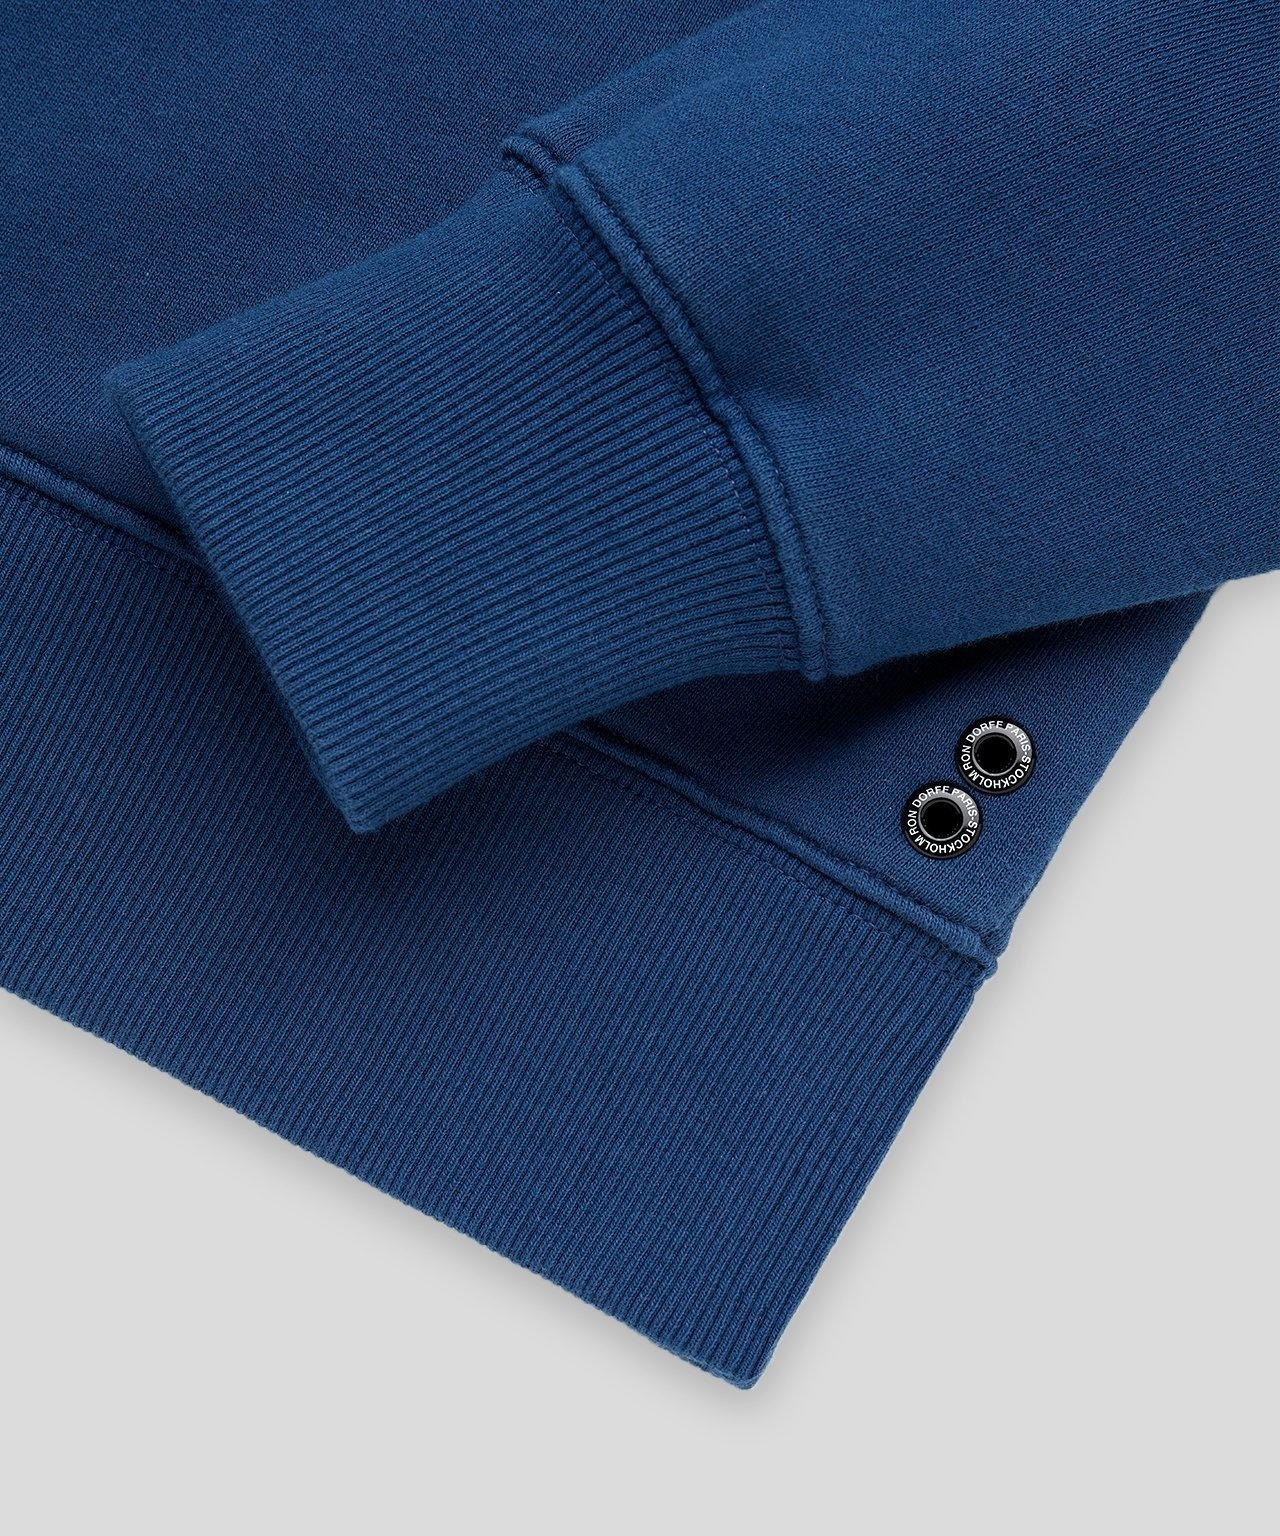 Ron Dorff DAD small prnt Sweatsh Viking Blue